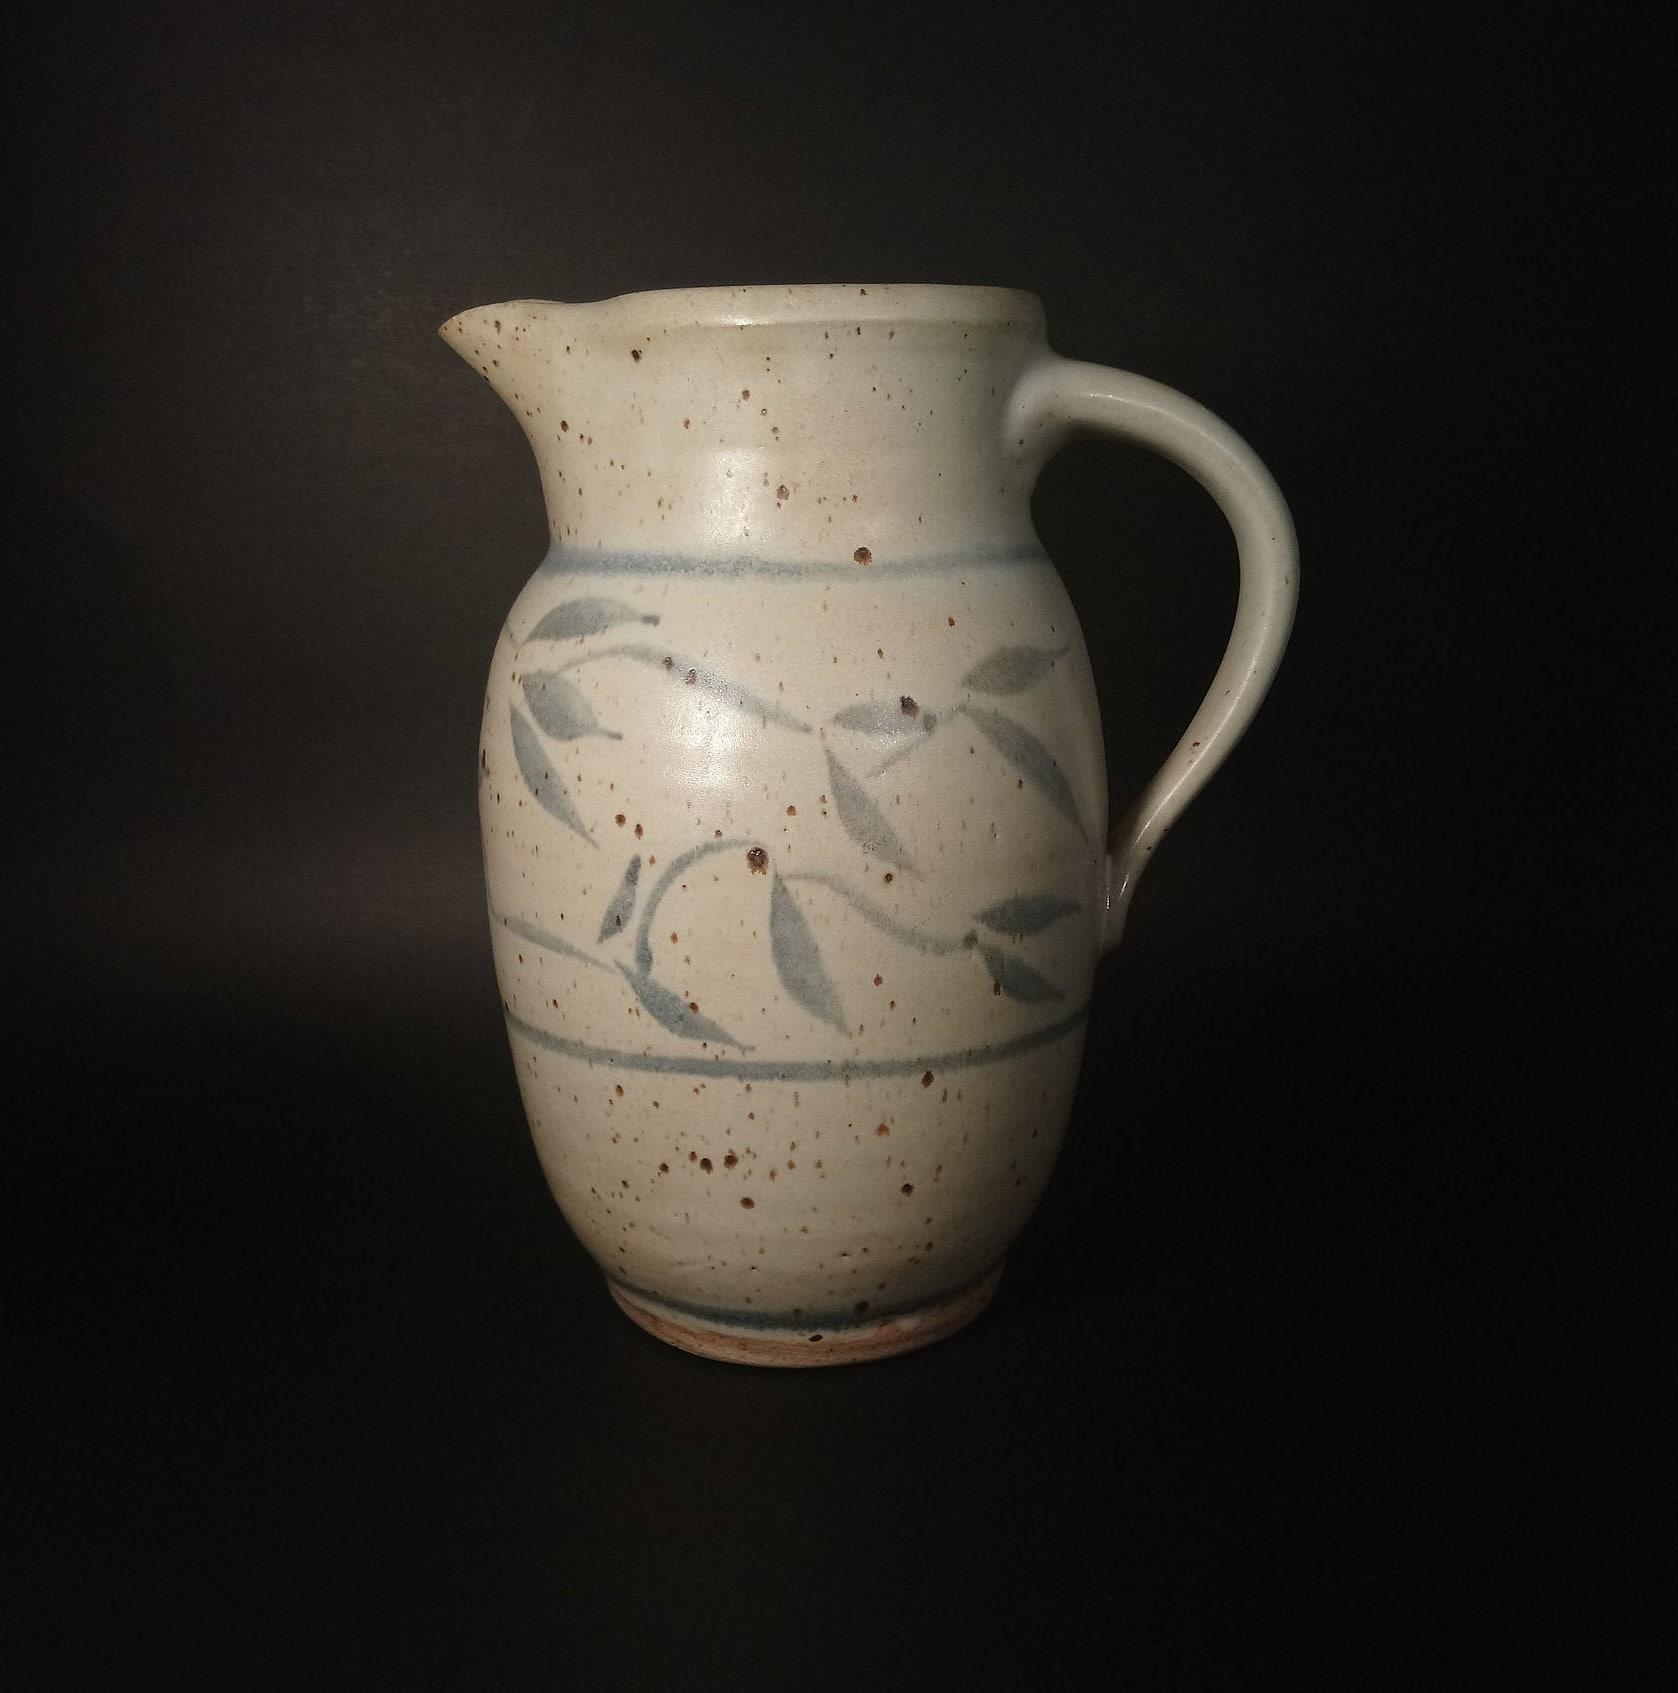 Studio Pottery Jug Vintage Pottery Jug Handmade Pottery Clay Jug